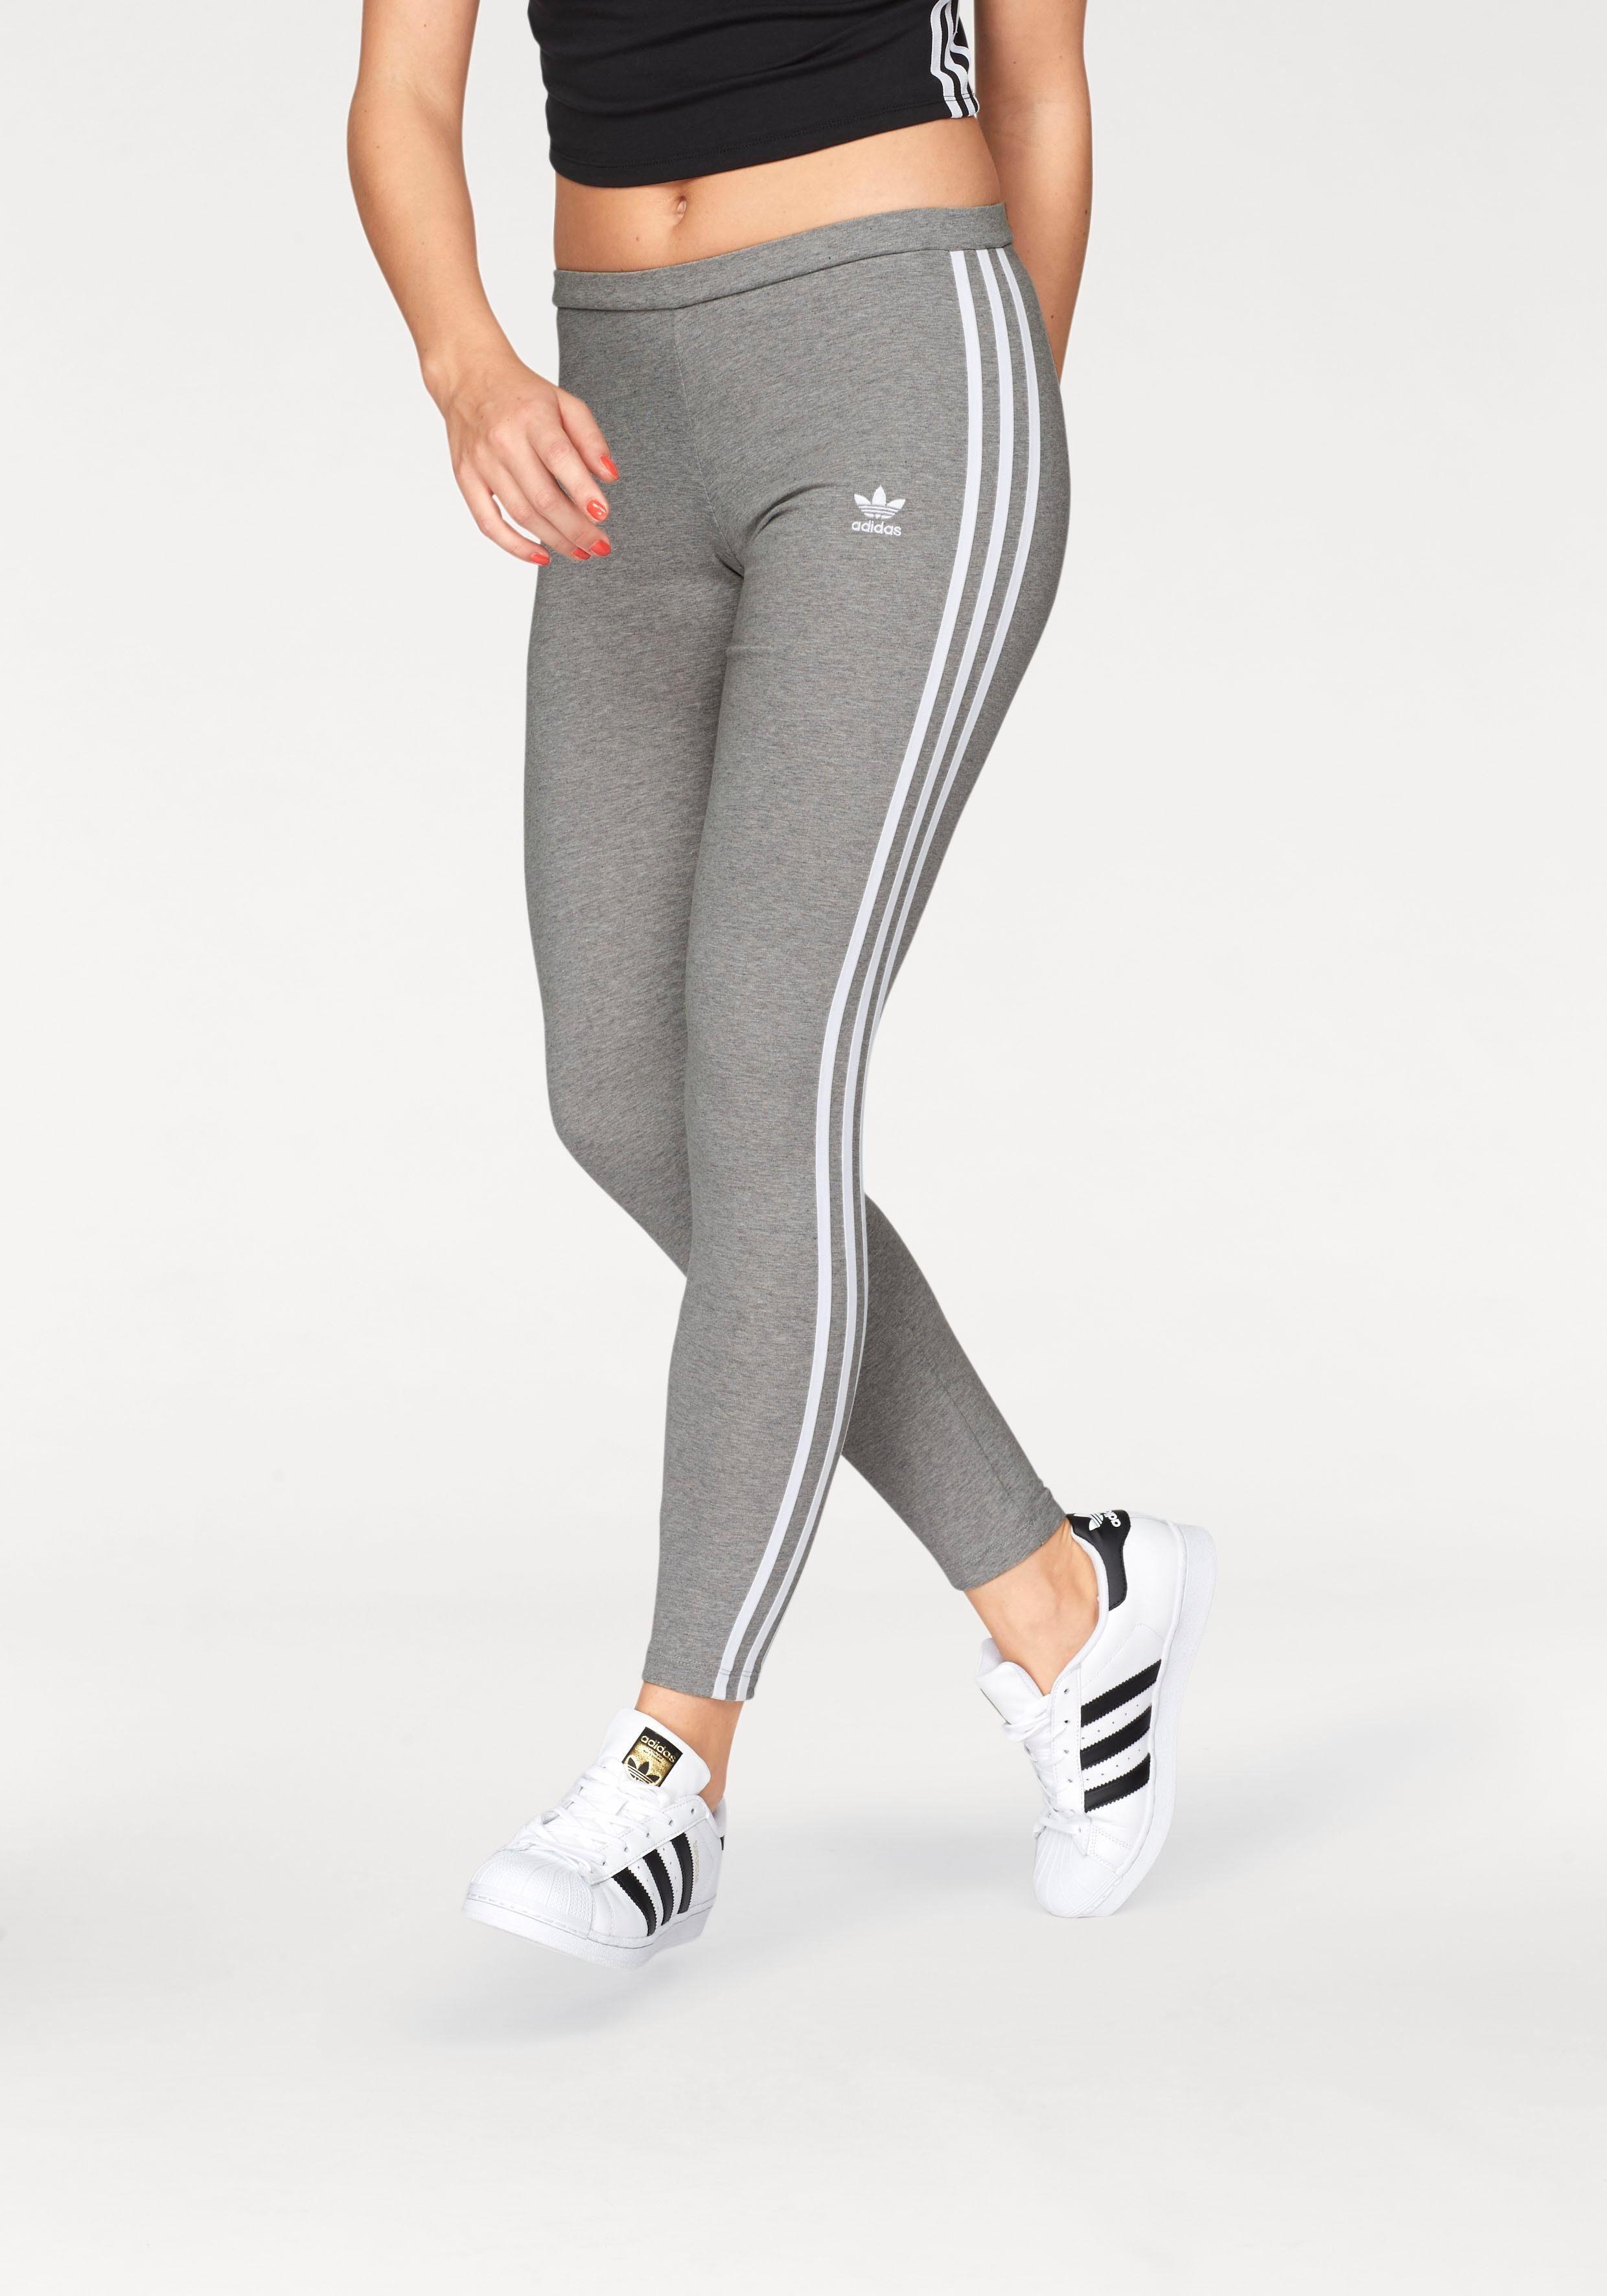 OTTO | SALE Damen adidas Originals Leggings »3 STRIPES TIGHT